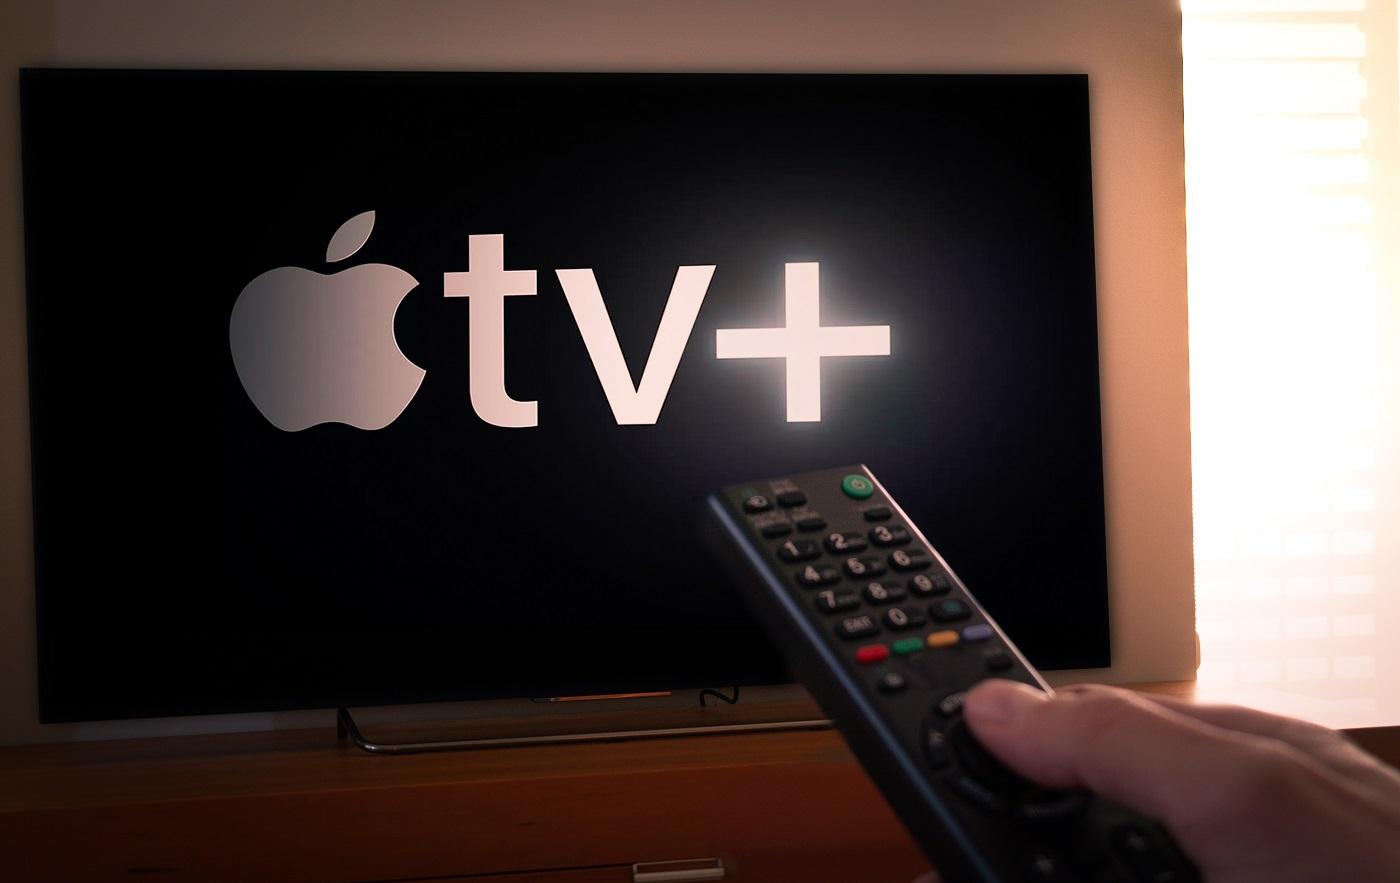 shutterstock_apple tv plus